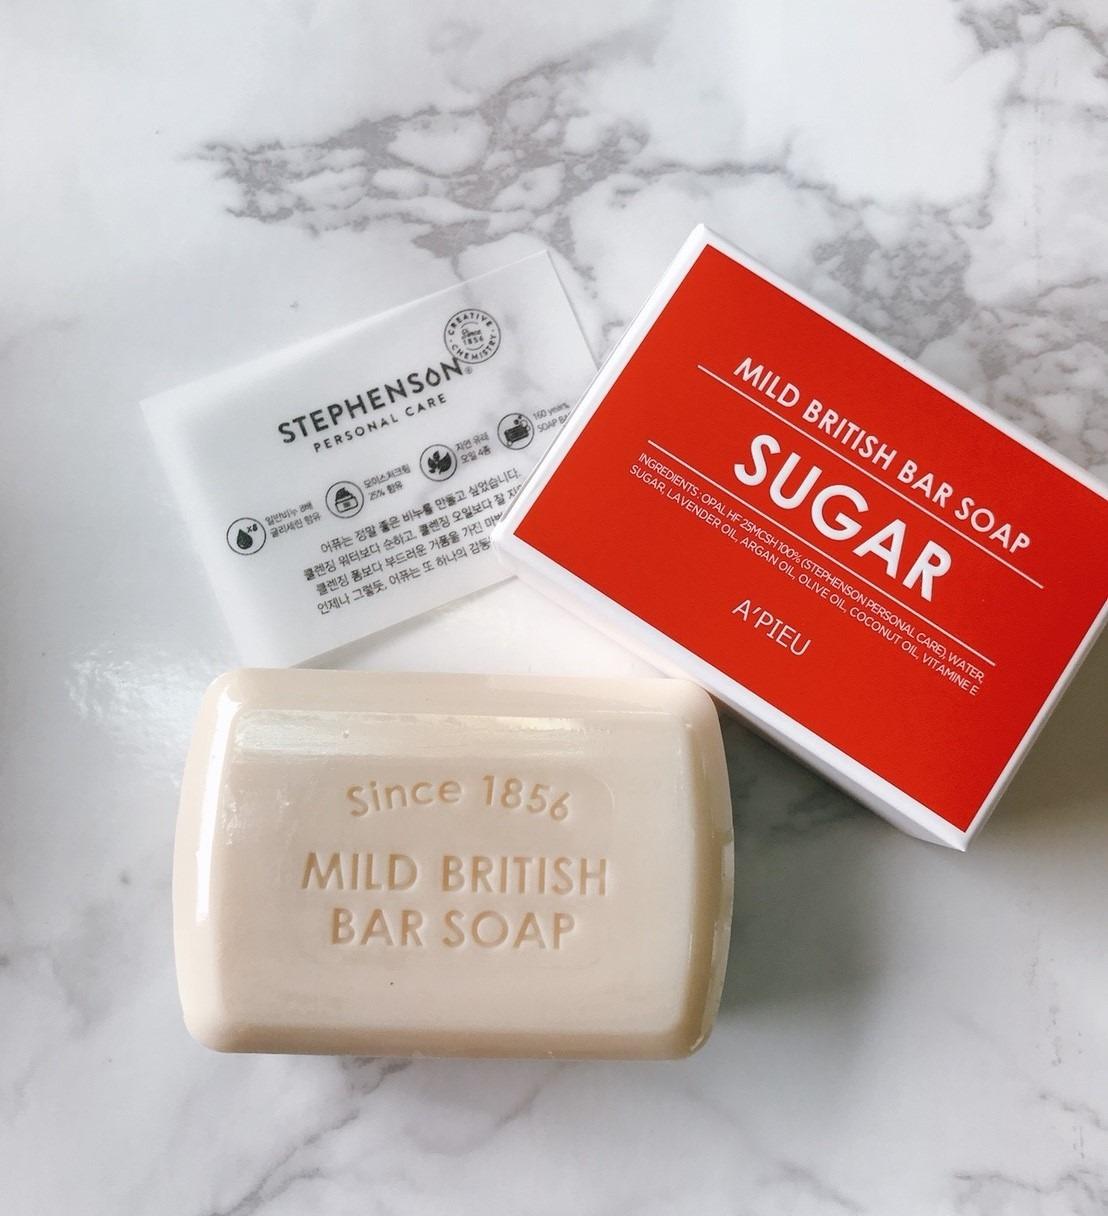 A'PIEU這款清潔皂很貼心的根據四種不同的膚質推出四種功能的肥皂,不管是什麼樣的膚質都能挑到最適合自己的清潔皂喔! 首先要介紹的是這顆適合乾肌使用的紅色皂。添加了砂糖成分加強保濕,含有豐富的甘油成分更能鎖住肌膚水分。乾肌女孩選這款就對啦!